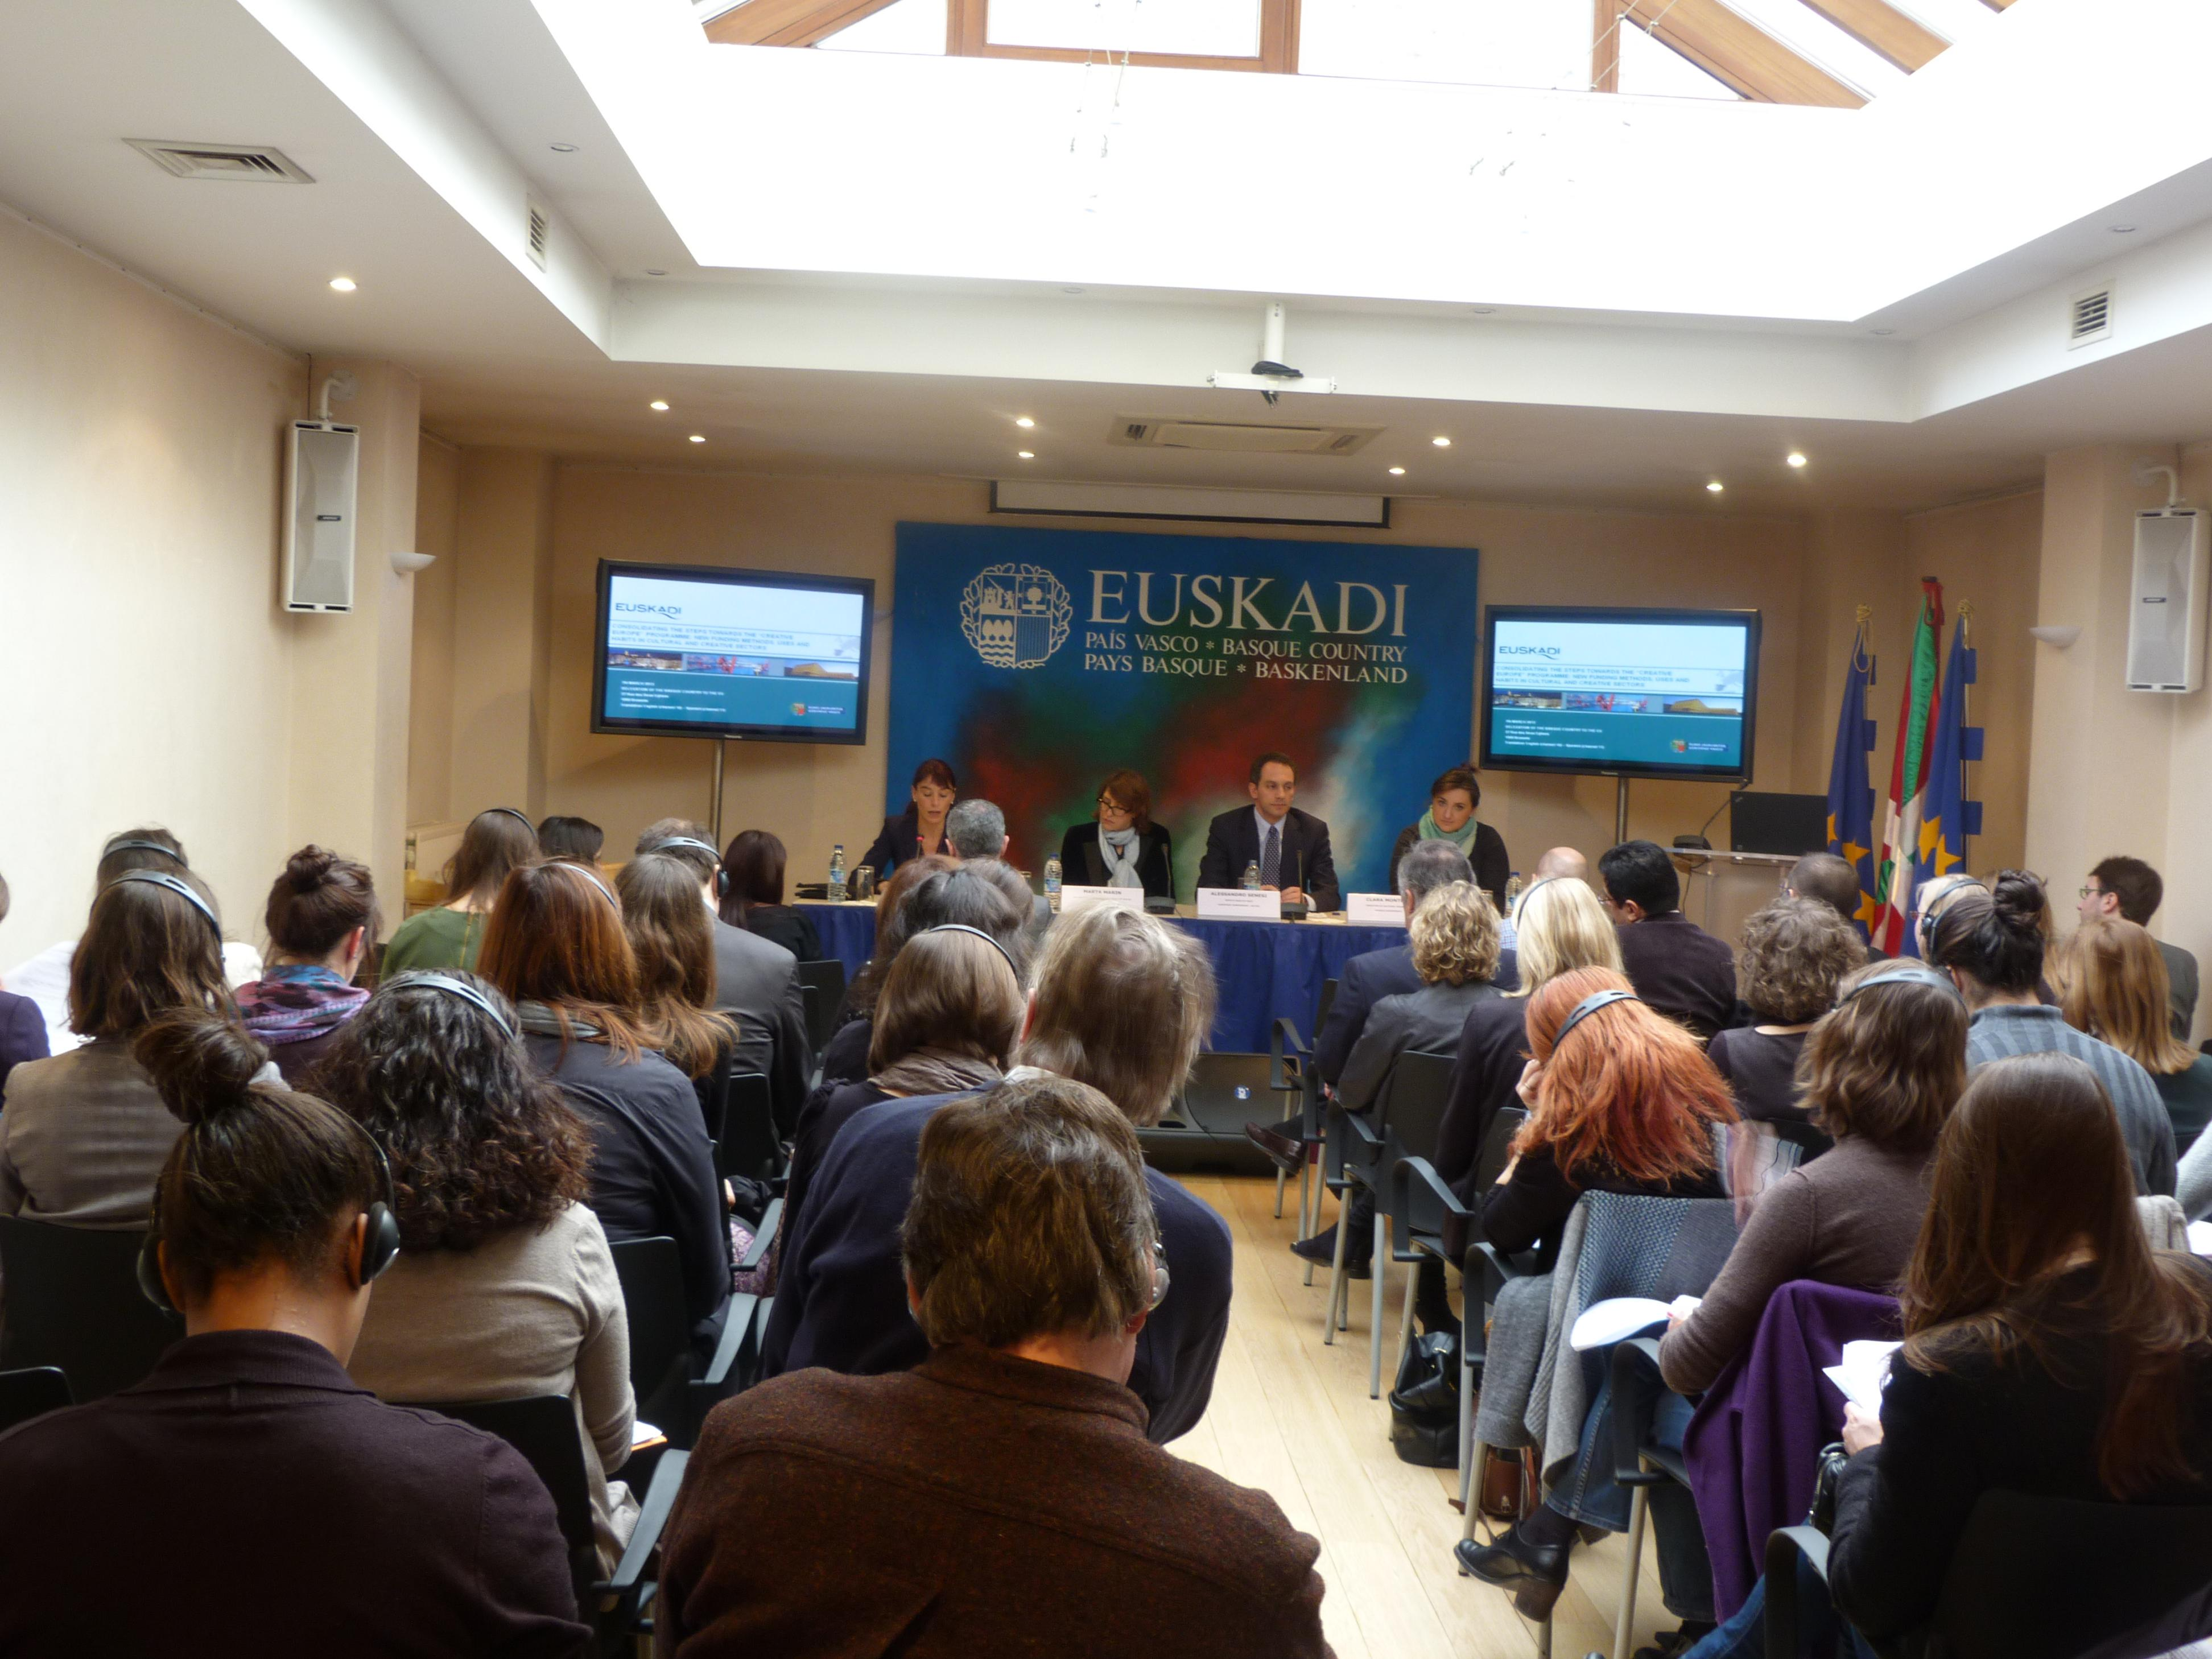 Conferencia_ICC_Creative_Europe_2013_001.jpg